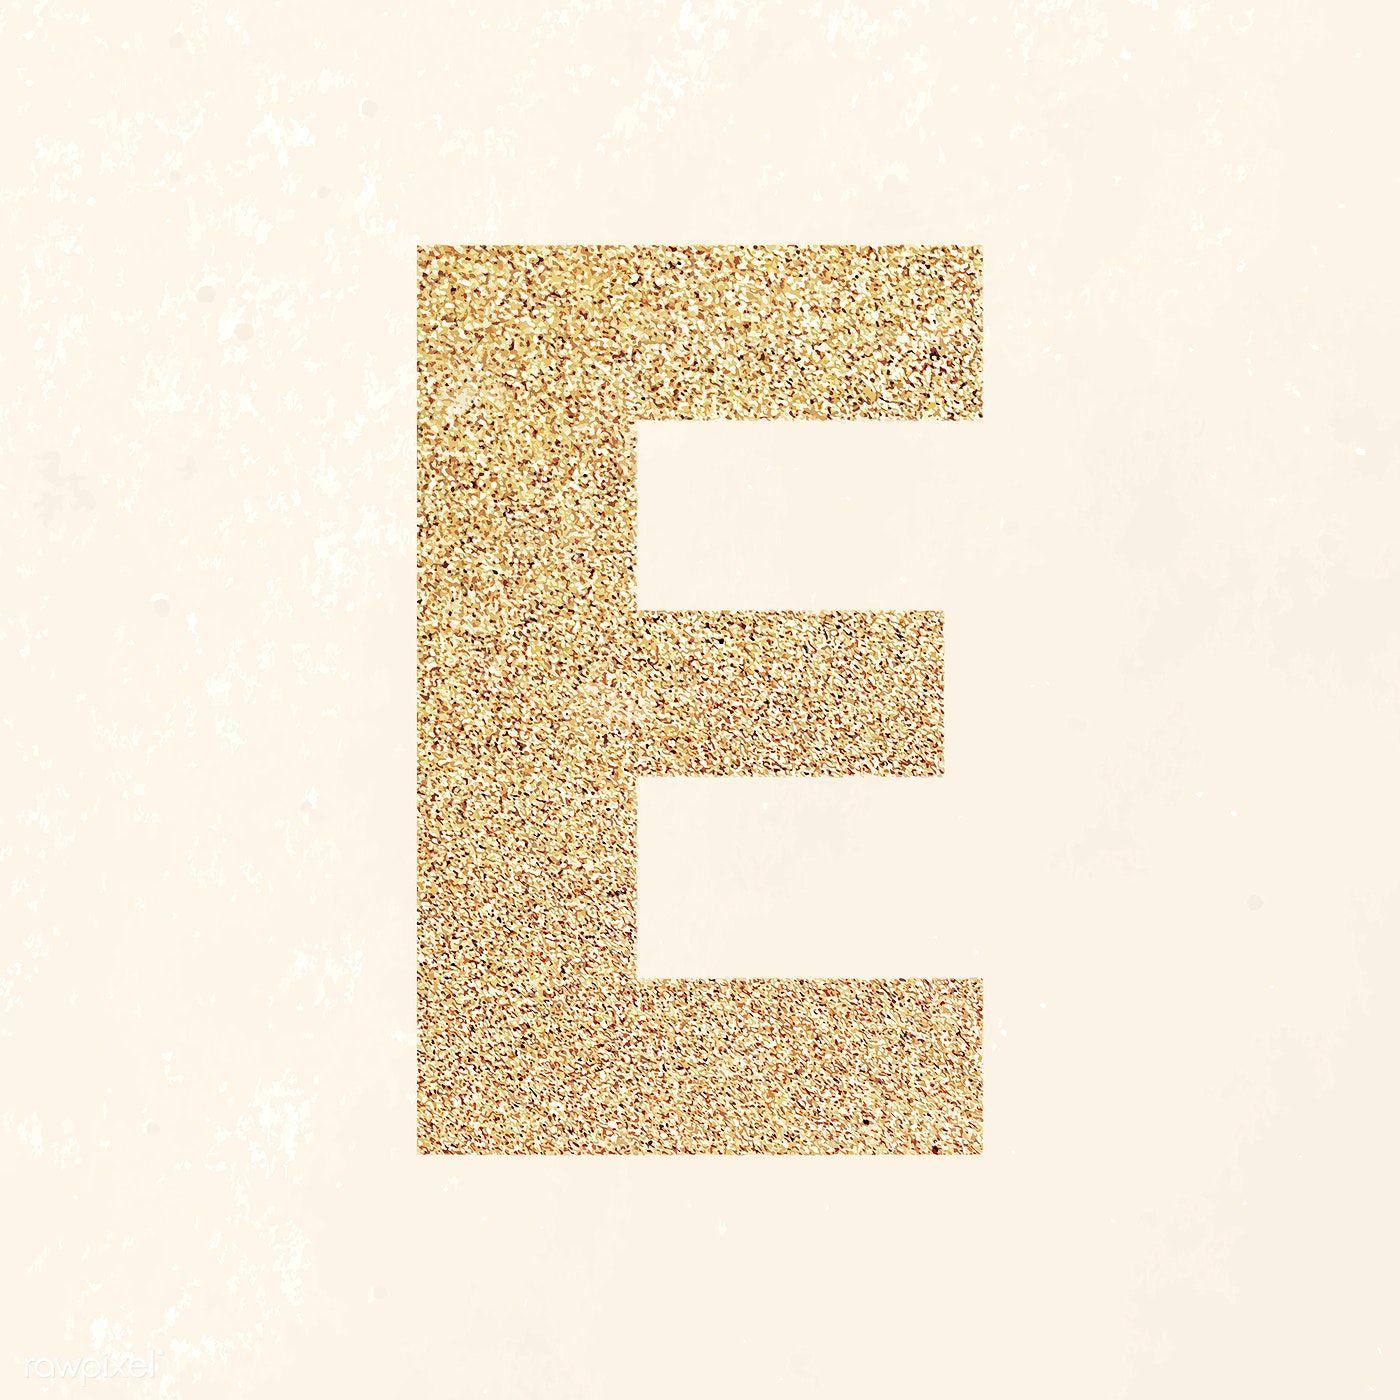 Glitter Capital Letter E Sticker Vector Free Image By Rawpixel Com Ningzk V In 2020 Lettering Alphabet Free Illustrations Image Glitter